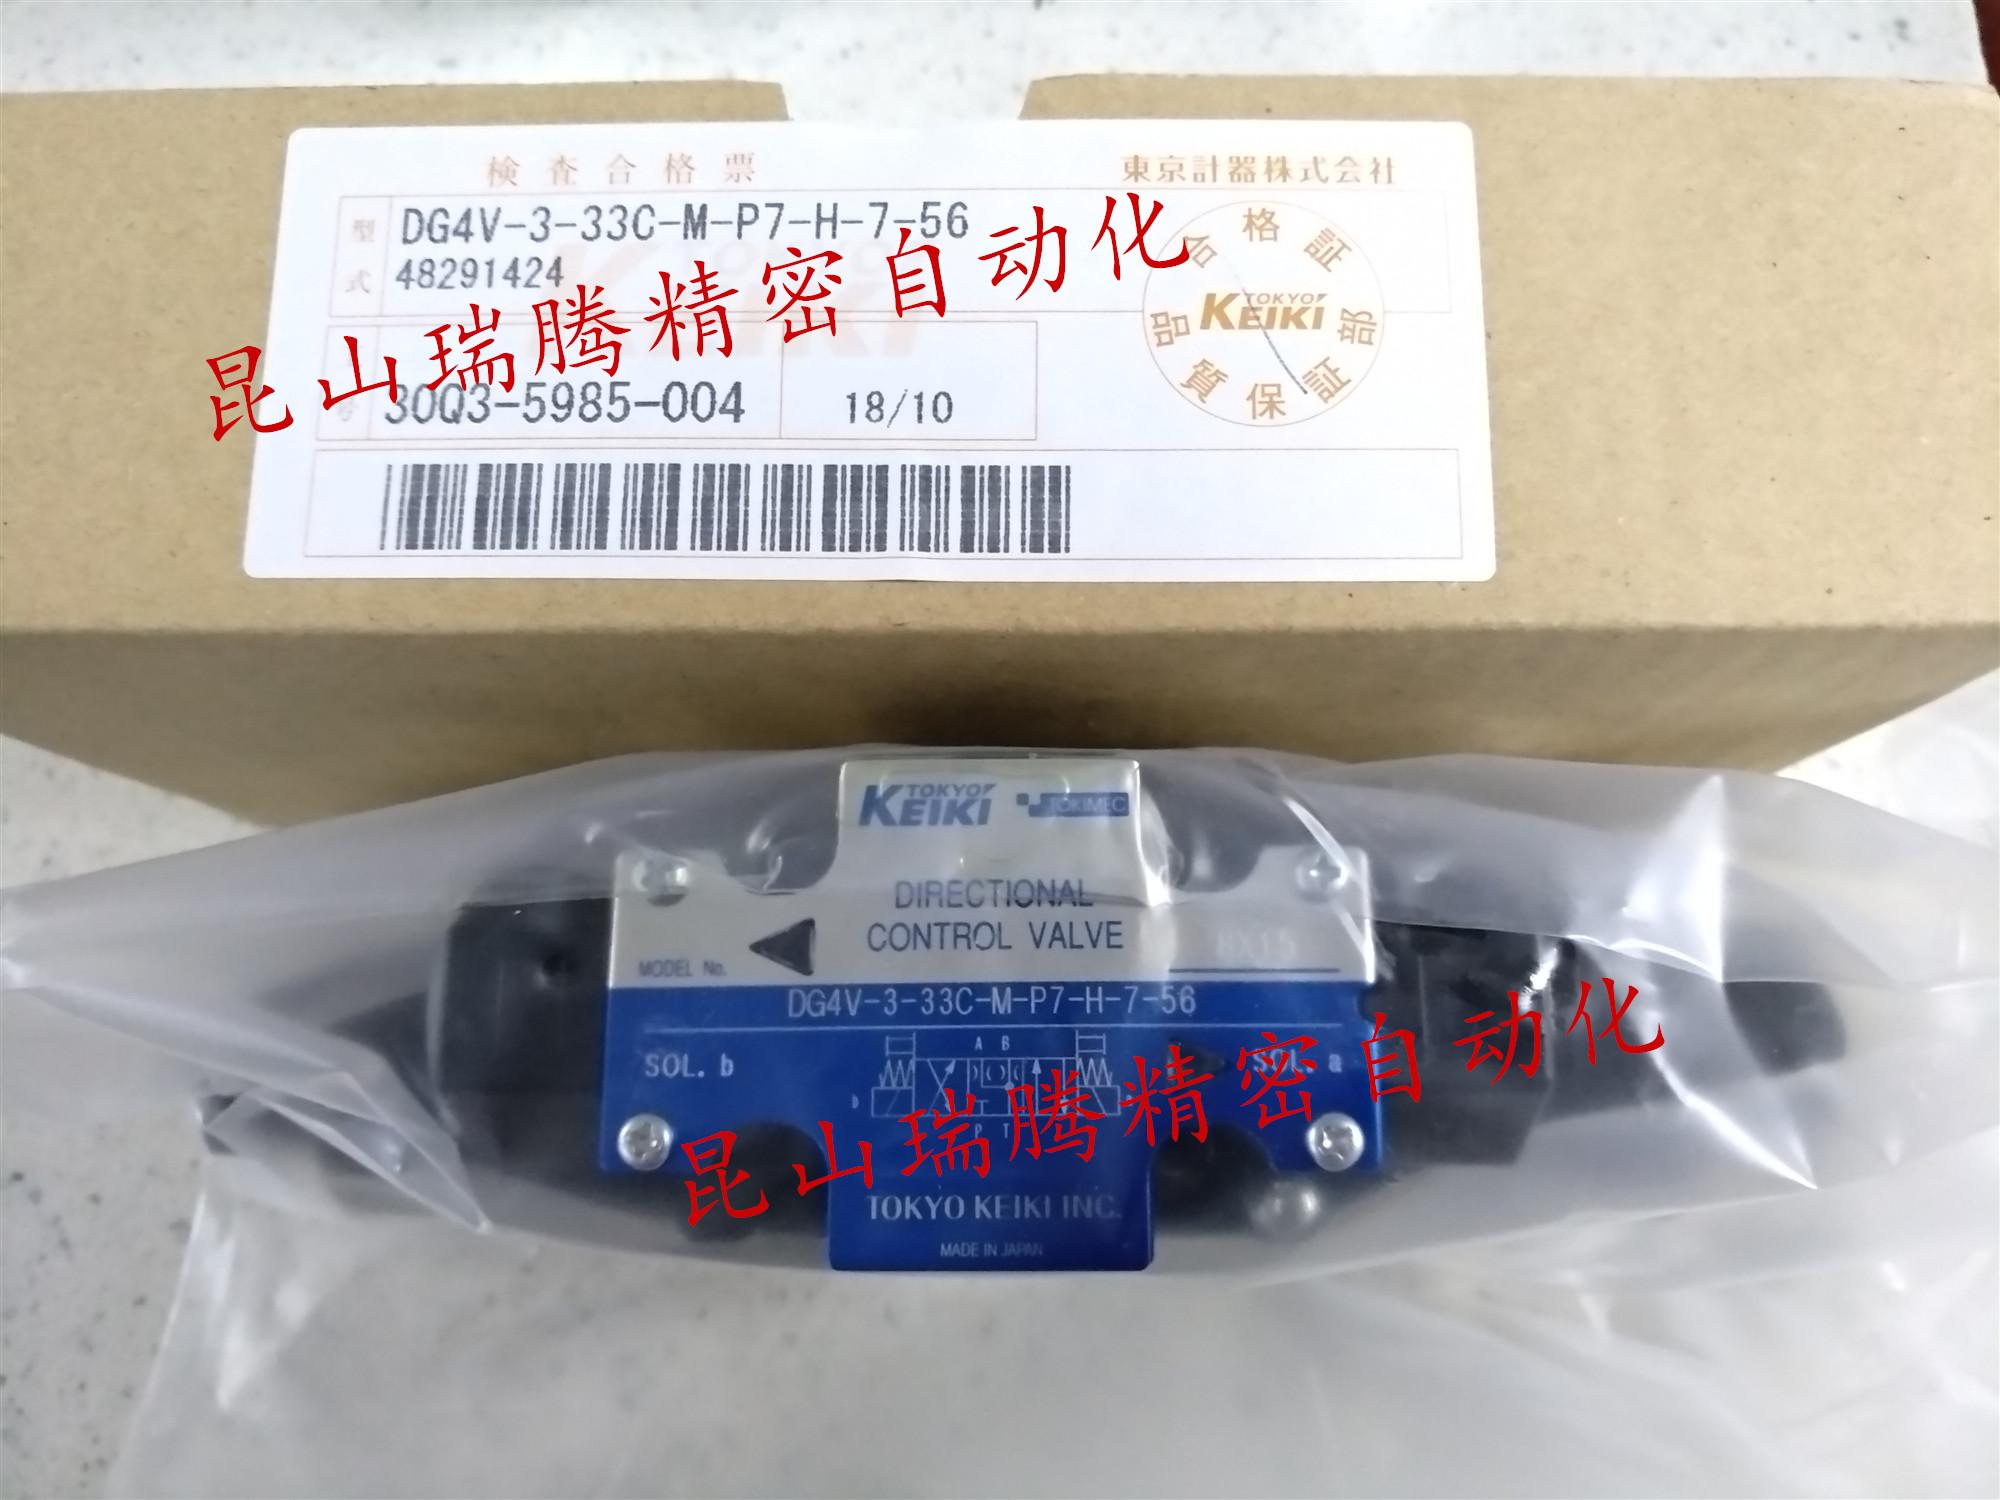 TOKYOKEIKI电磁阀DC24V接线盒型DG4V-3-33C-M-P7-H-7-56